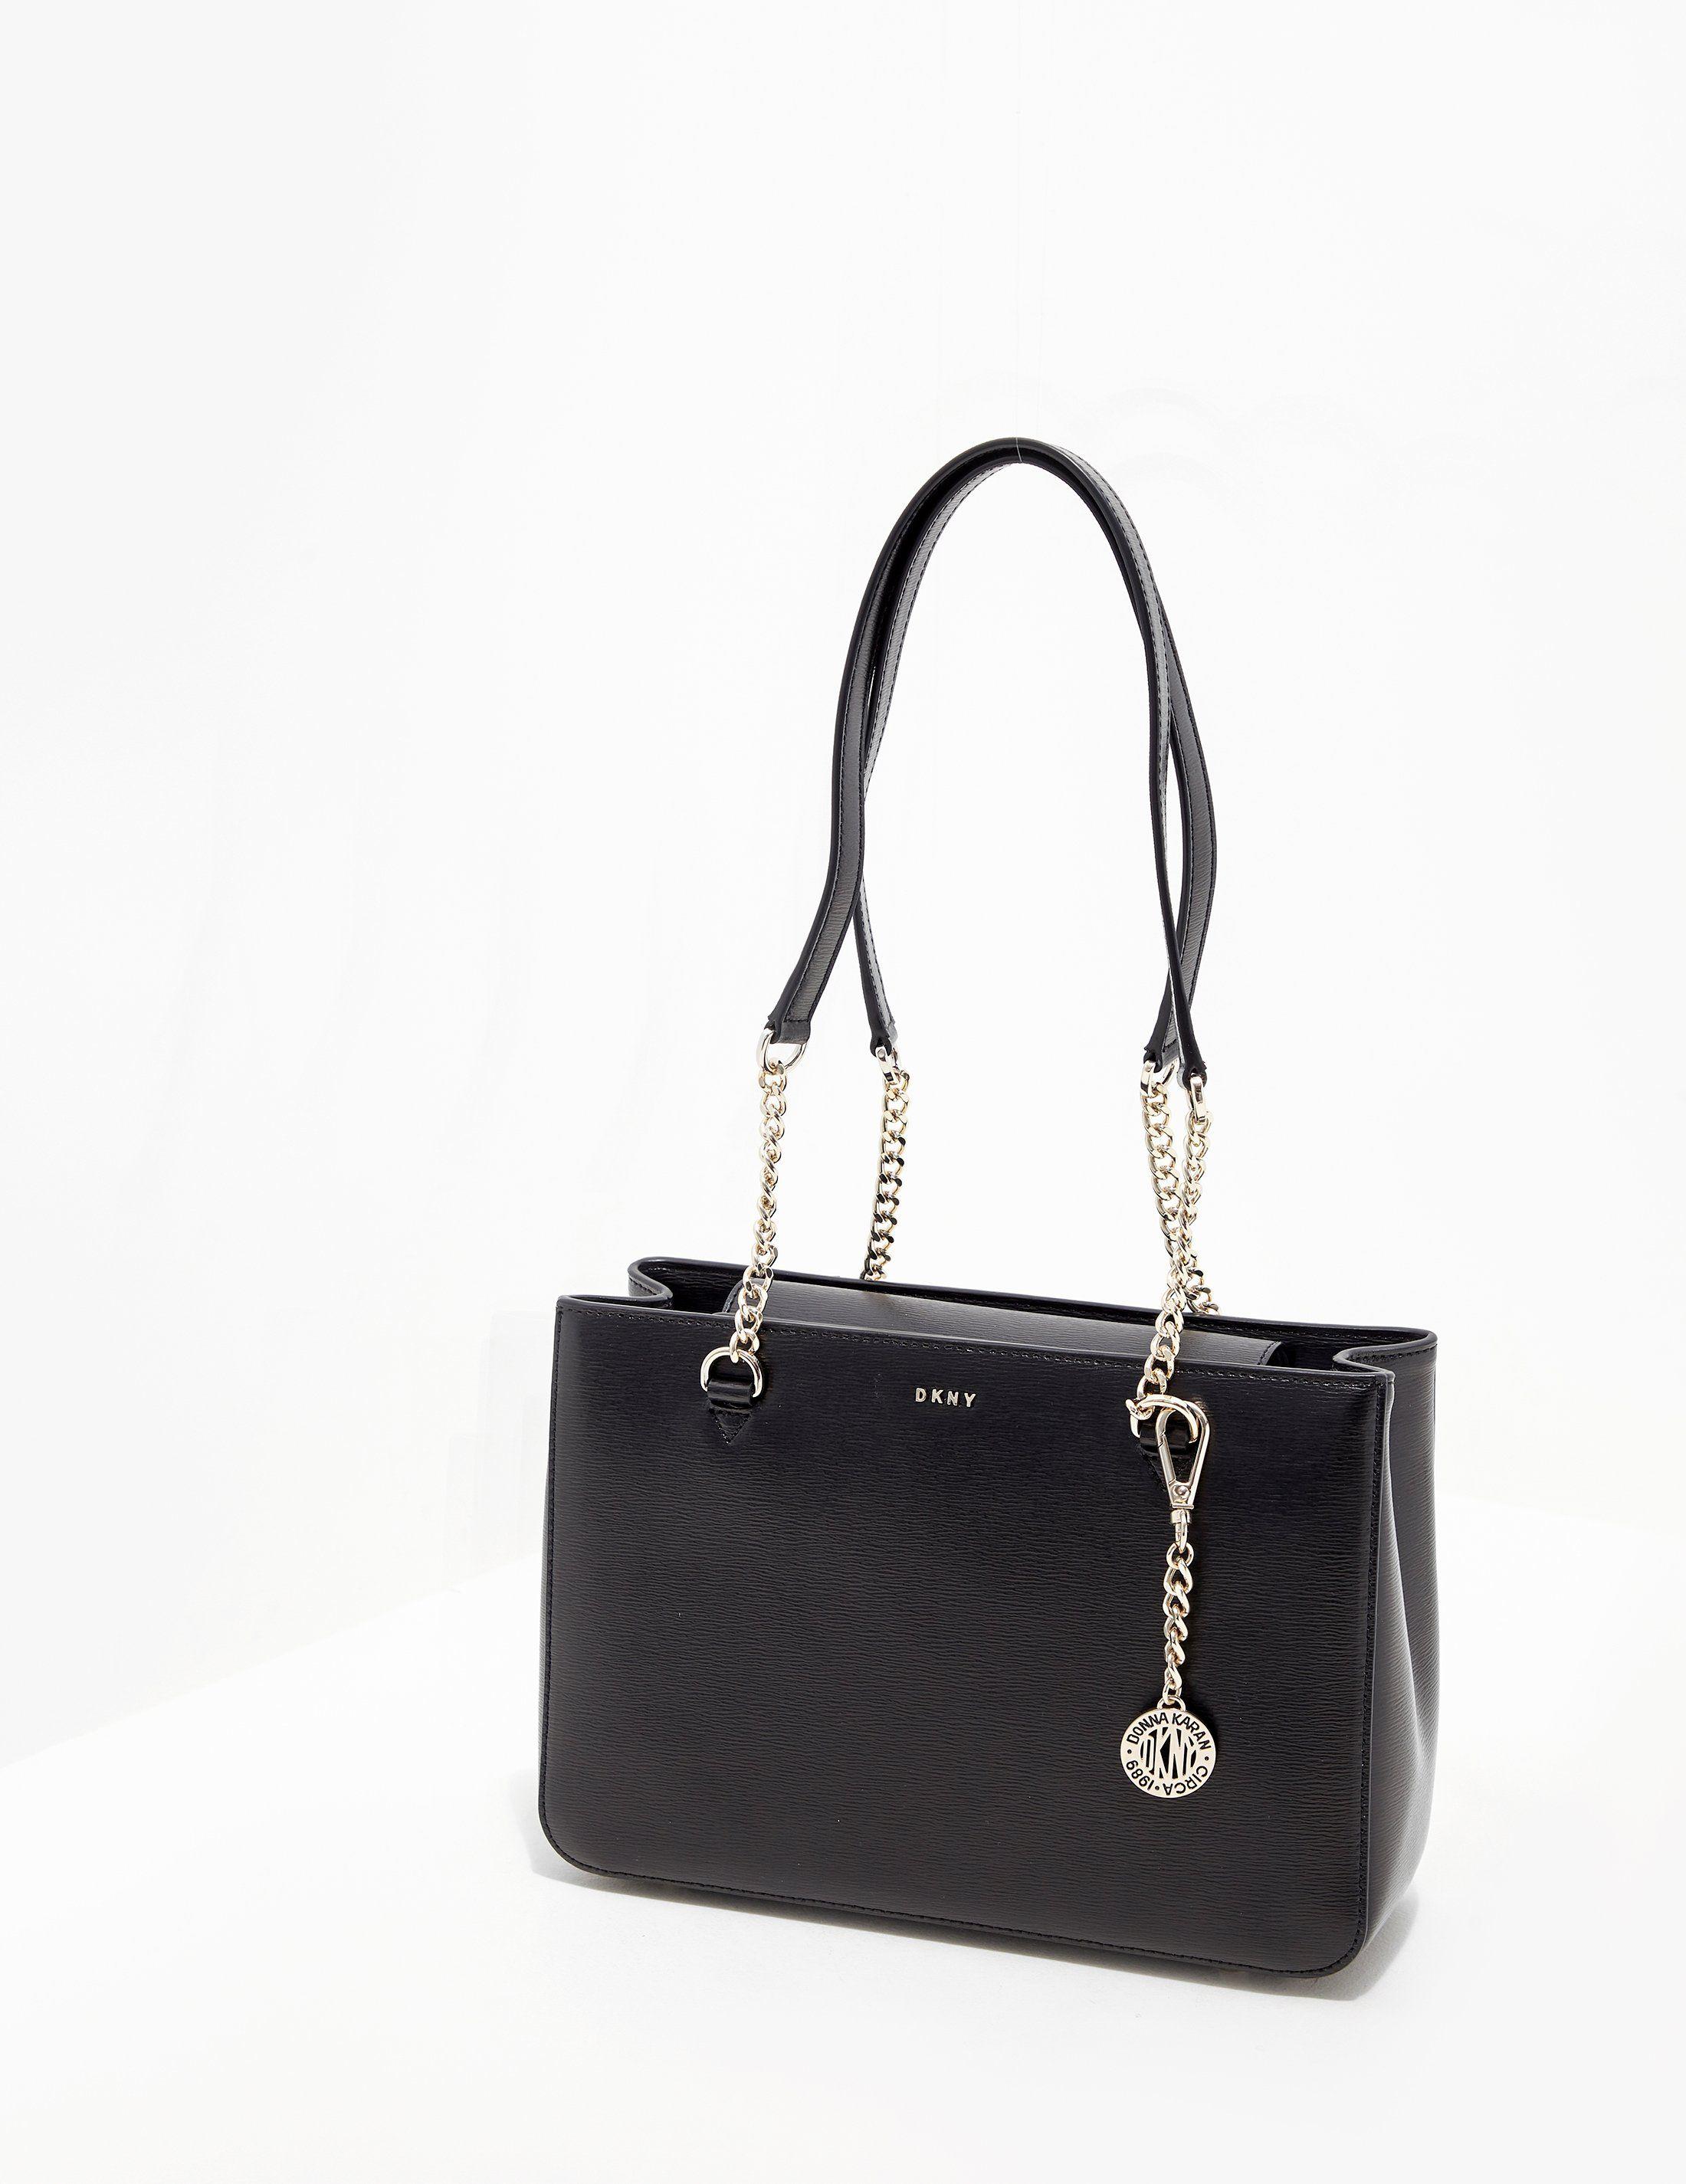 DKNY Bryant Tote Bag - Online Exclusive